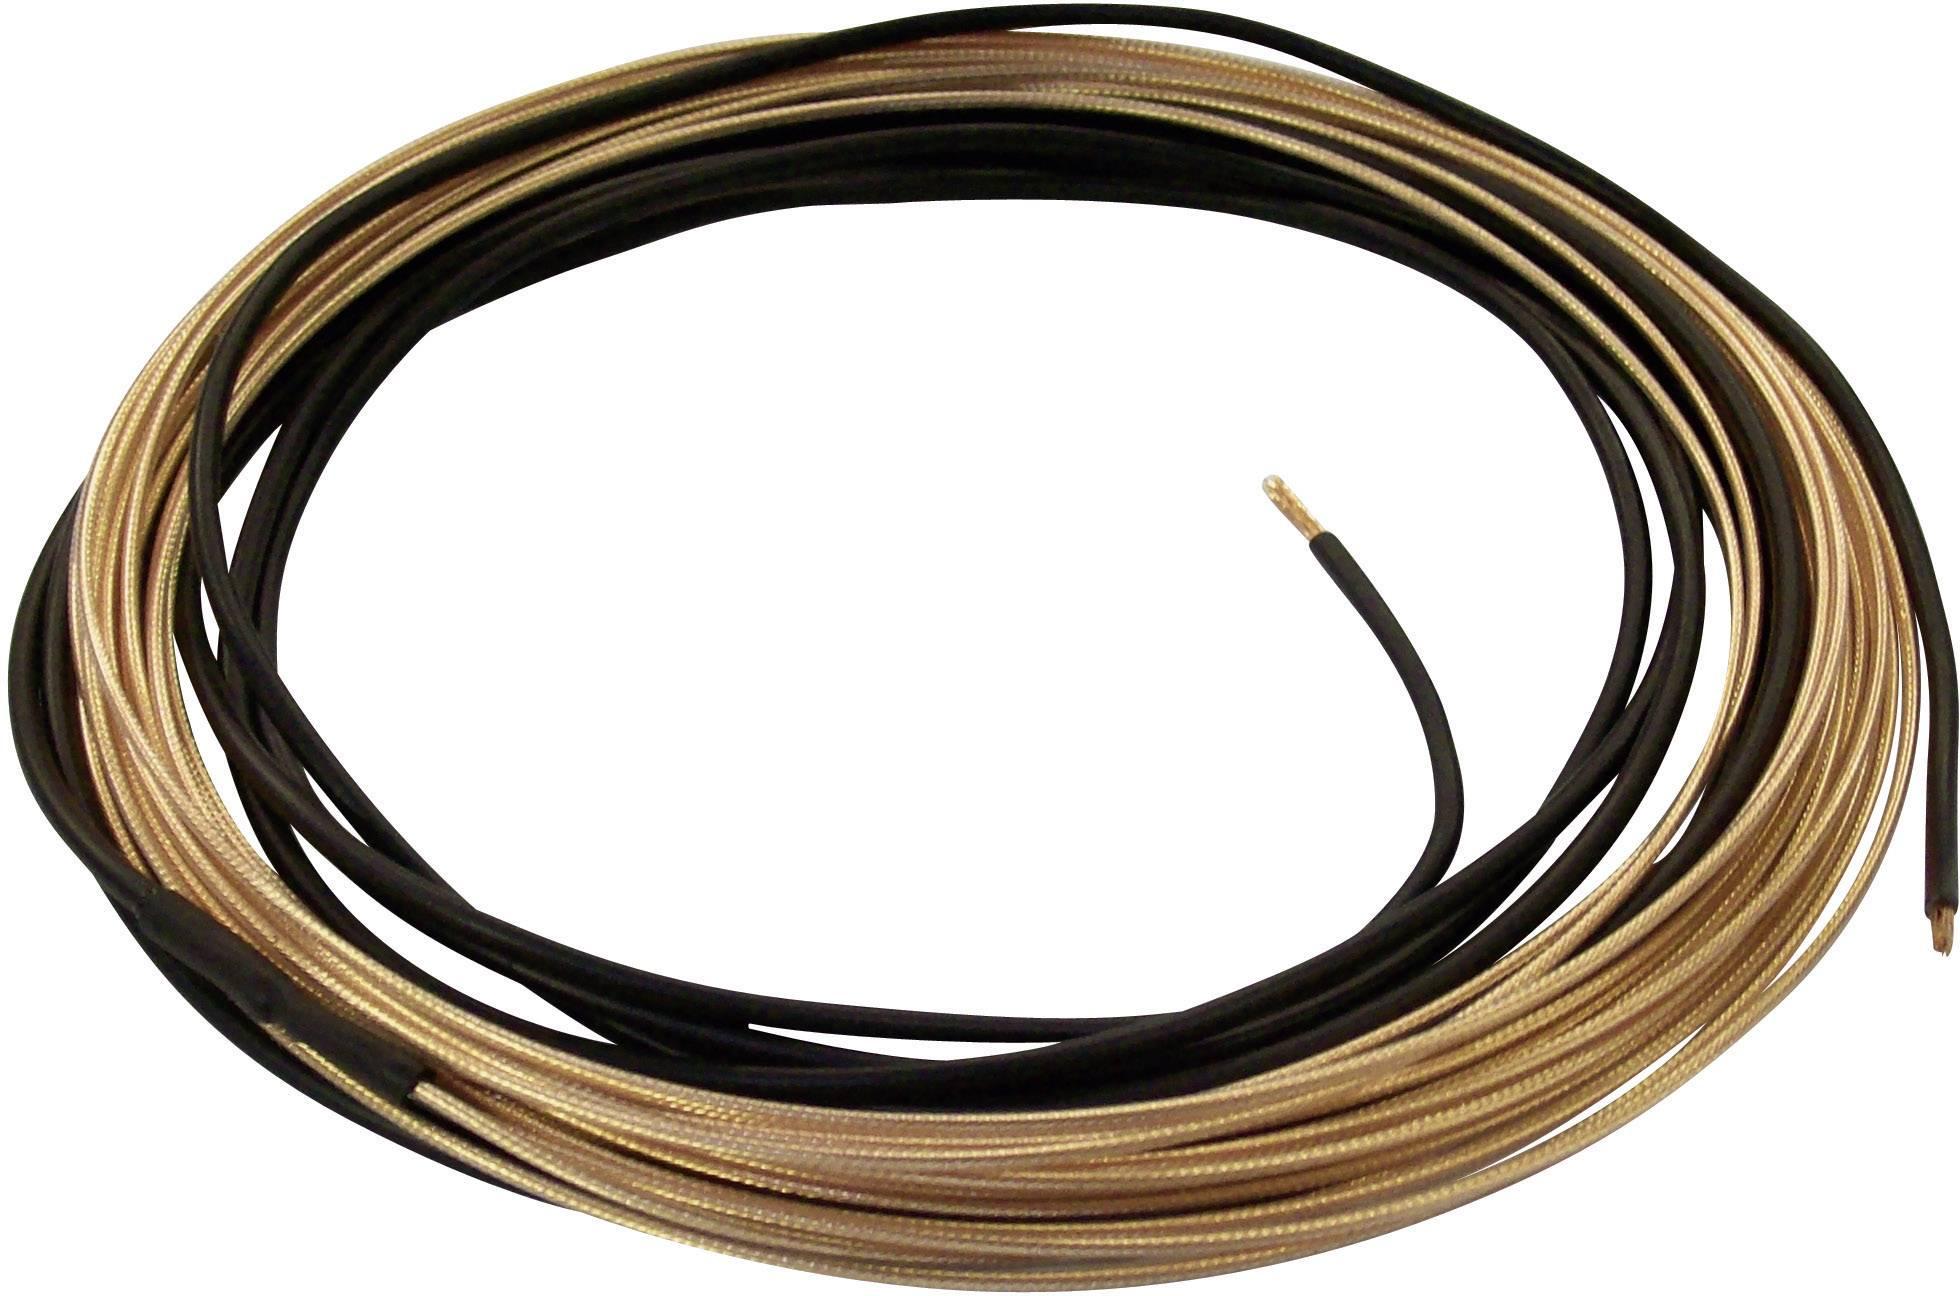 Vykurovací kábel Arnold Rak HK-5,0-12, 75 W, 5 m